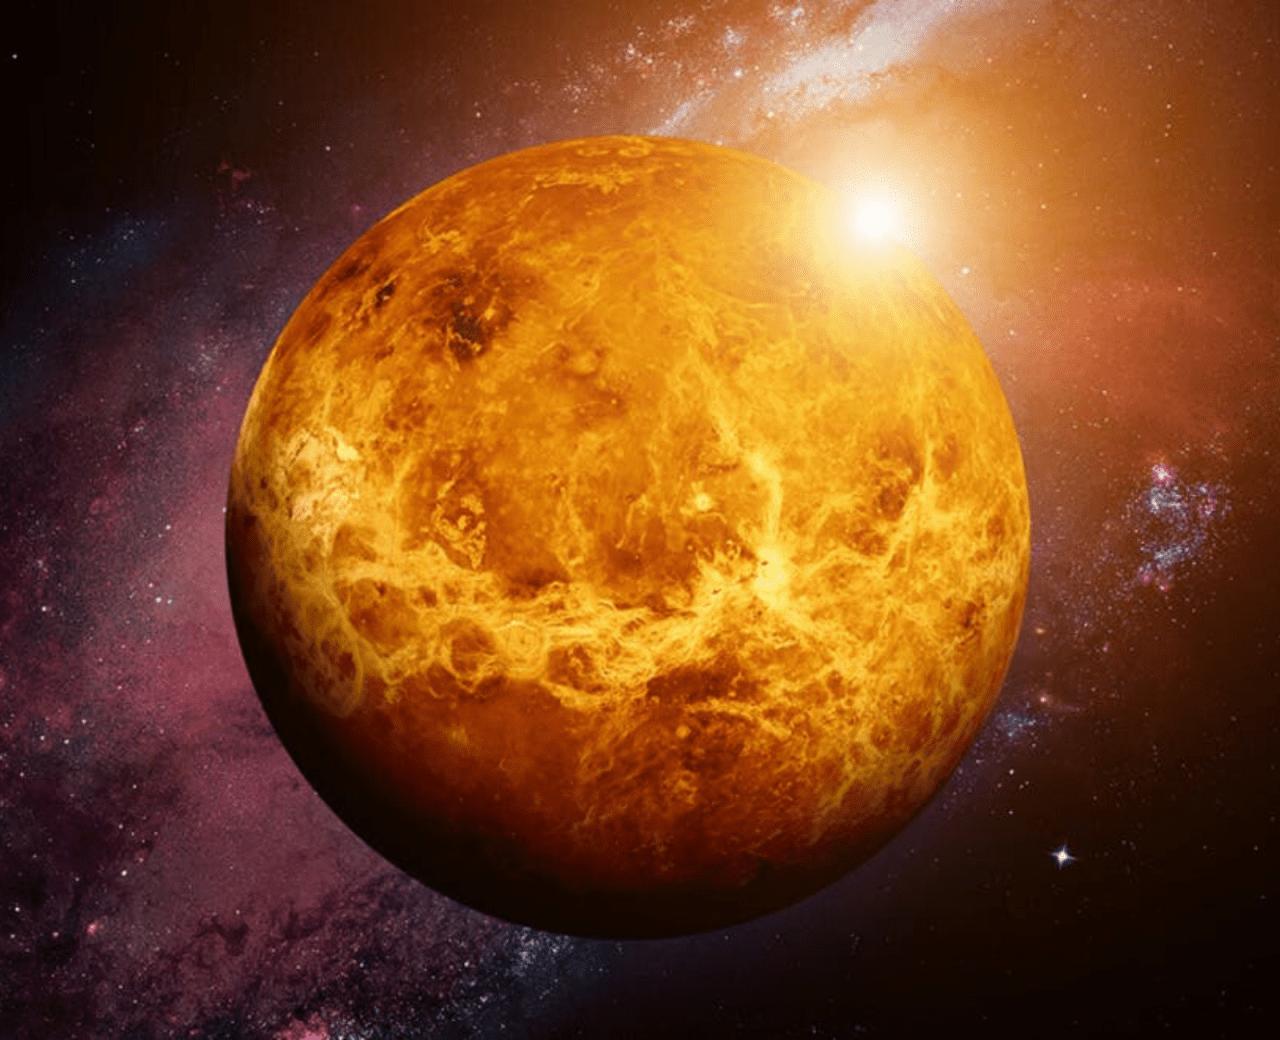 https://zachh.lt/wp-content/uploads/2020/01/veneros-planeta1-1280x1040.png